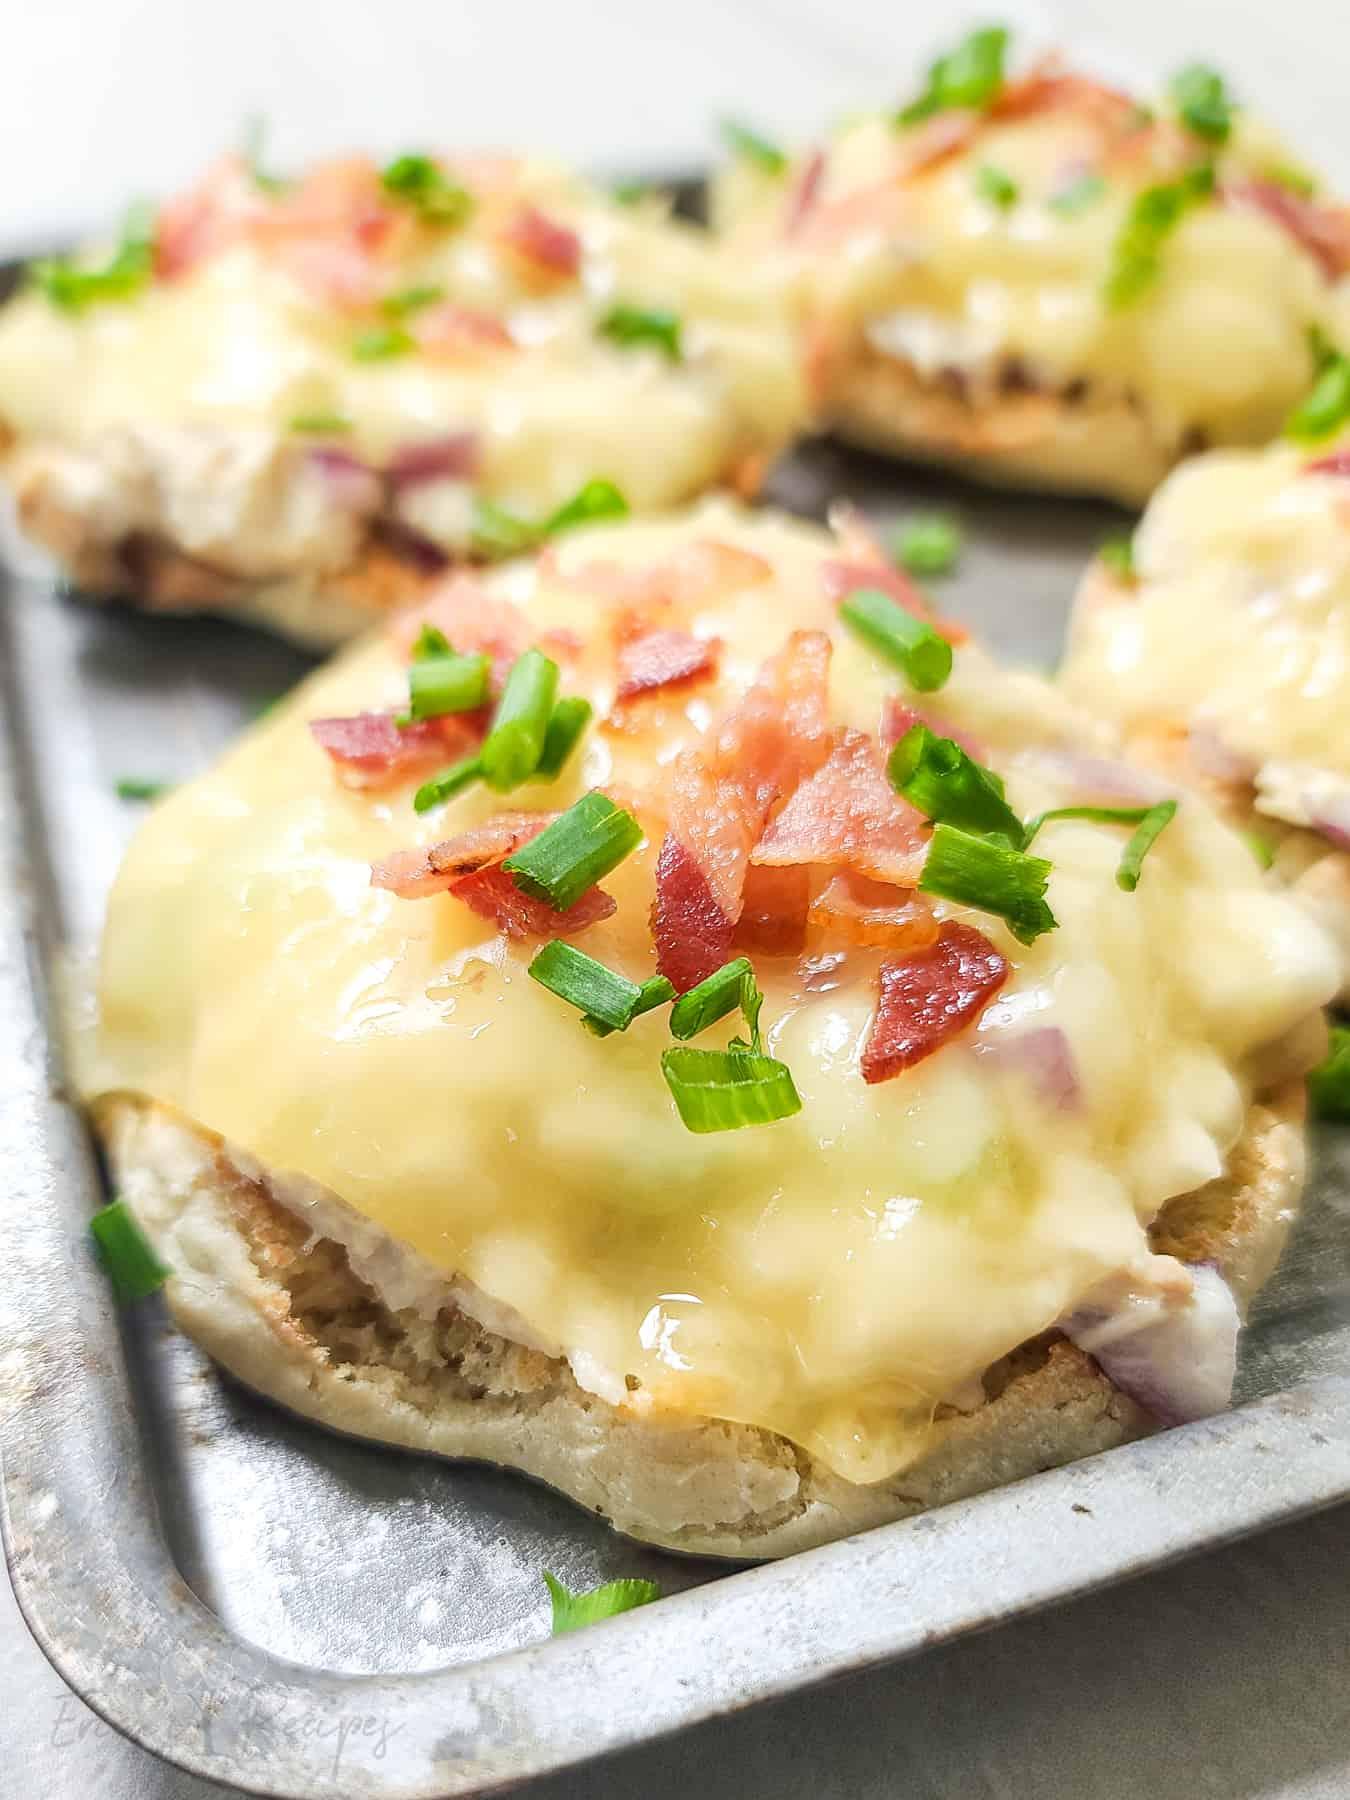 Open Faced Tuna Melt with Bacon